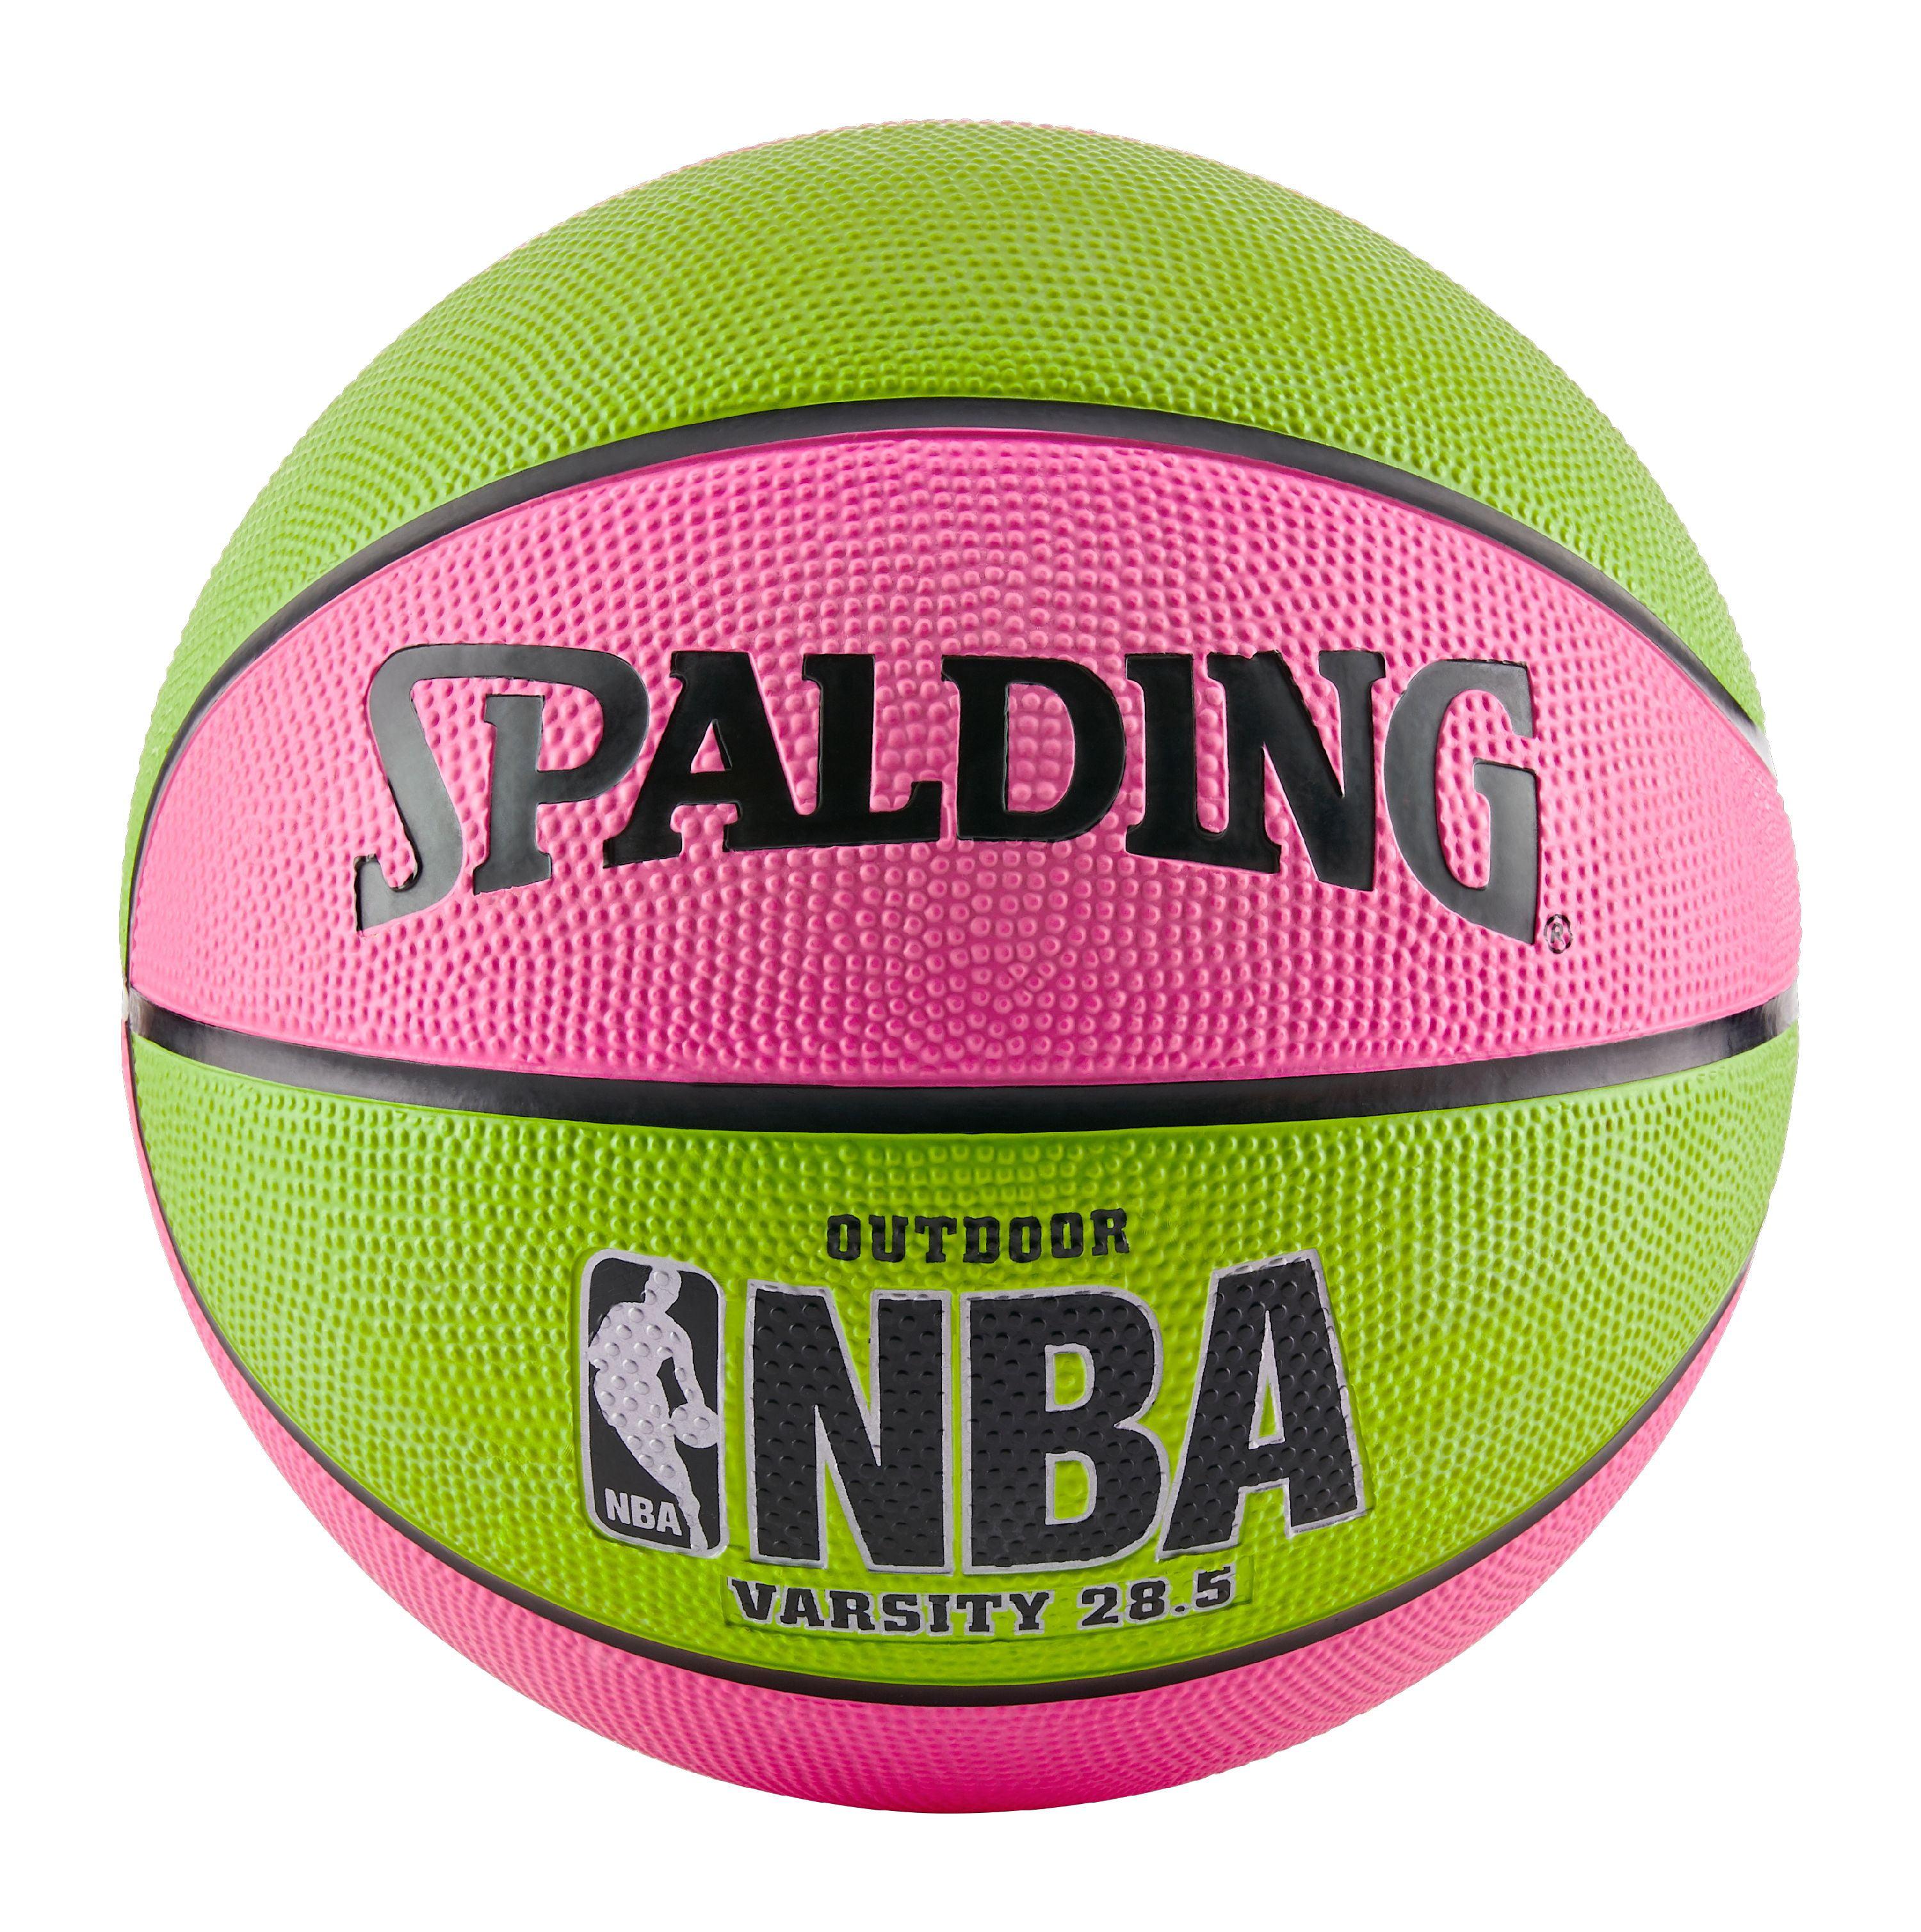 "Spalding NBA Varsity 28.5"" Basketball by Spalding"